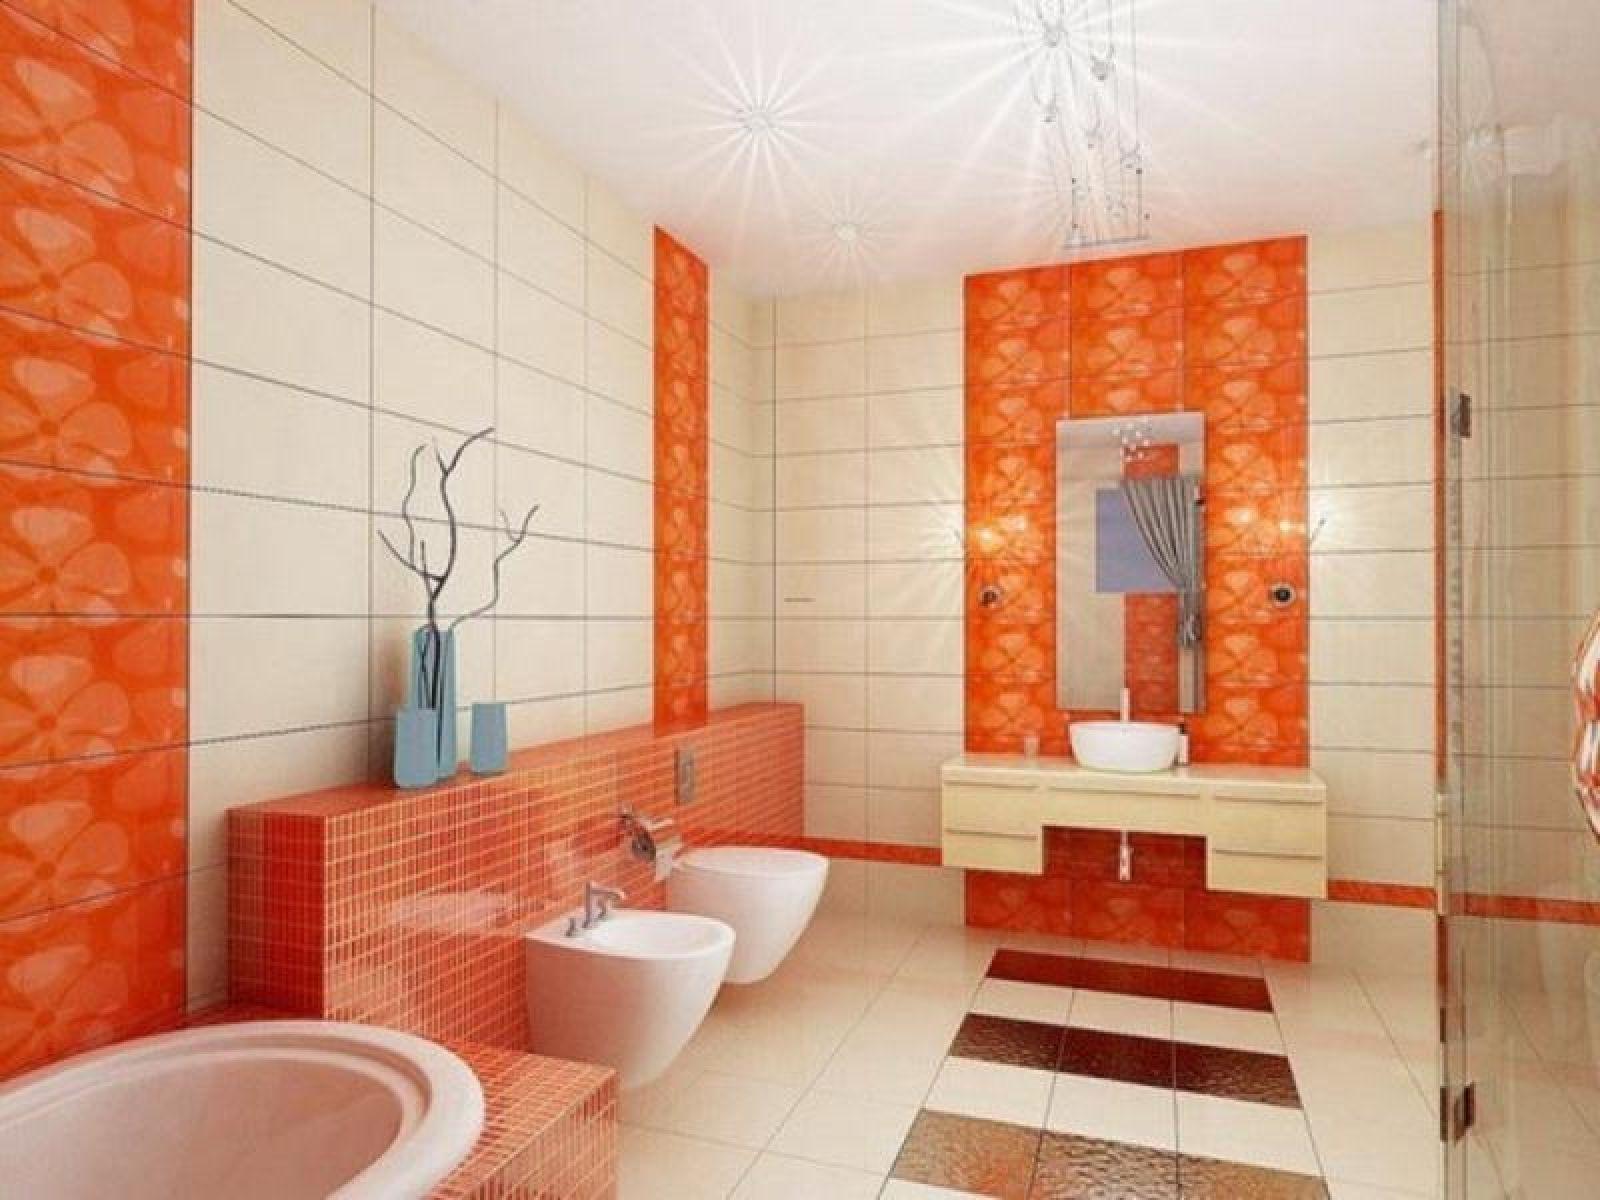 Orange Bathroom Designs Bathroom Designs Orange Bathrooms Designs Bathroom Interior Orange Bathrooms